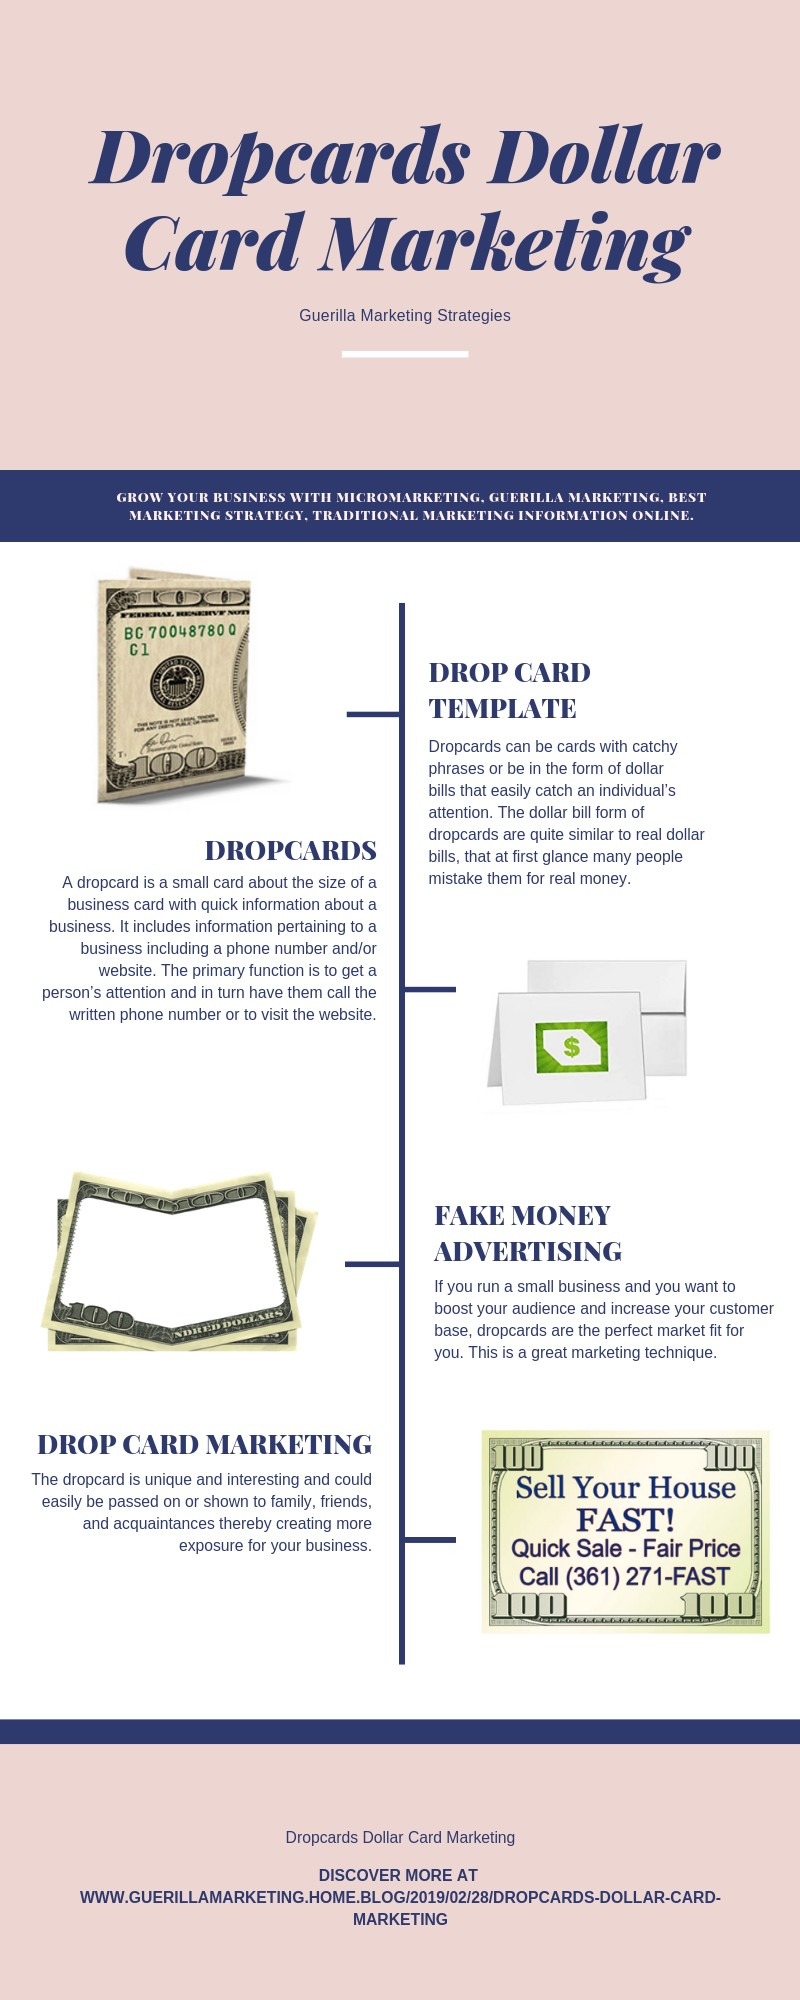 Drop Cards: Dollar Card Marketing & Guerilla Marketing Strategies